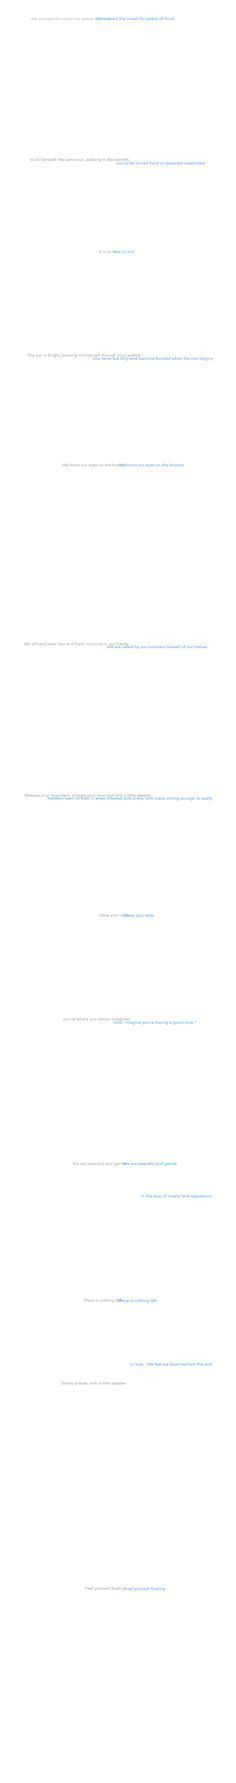 Blank Affidavit Template Form #AffidavitForms | Affidavit Form ...